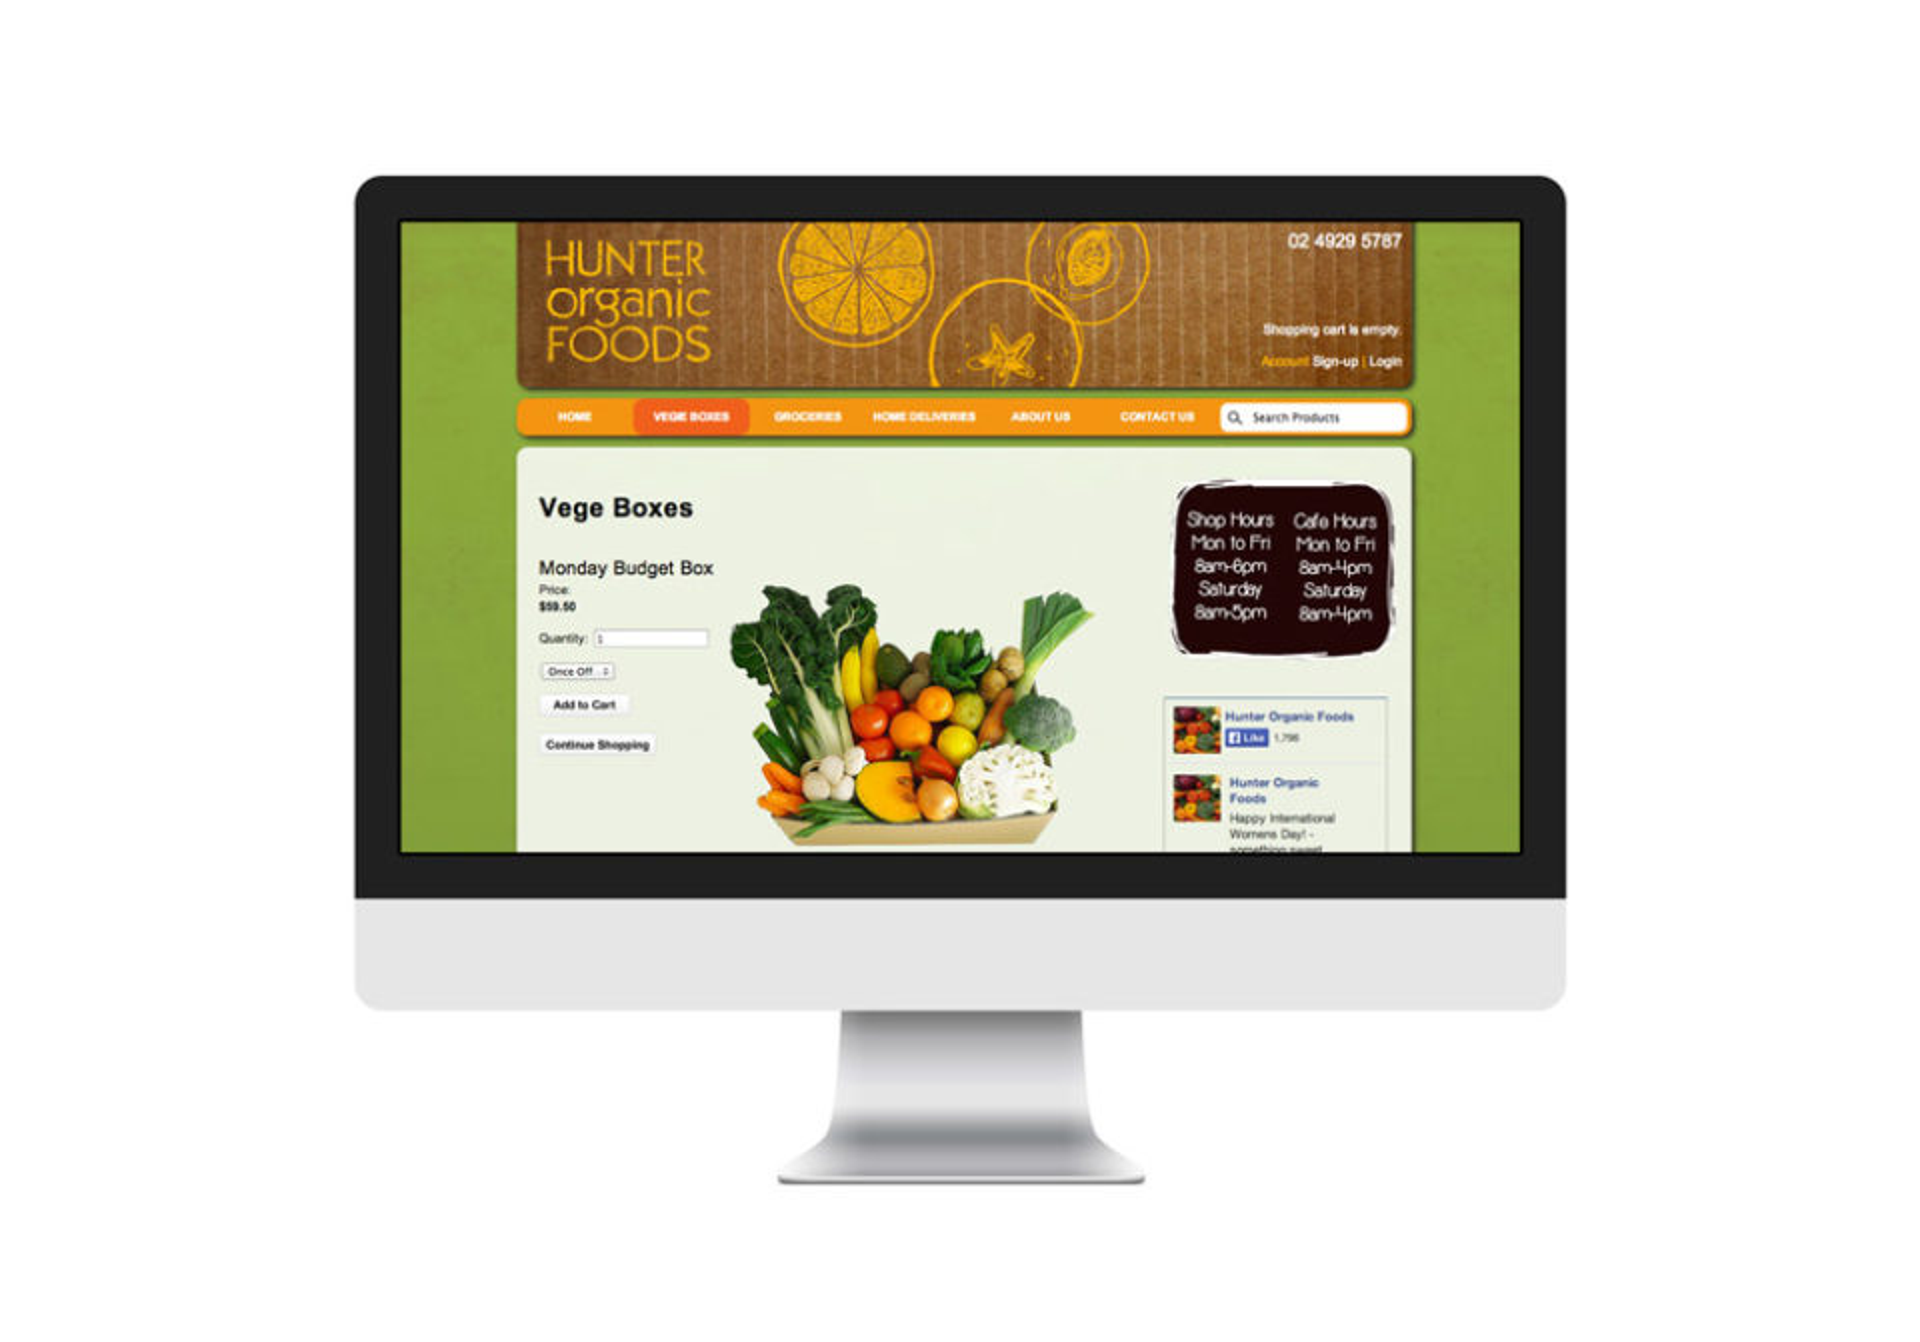 Hunter organic foods 04